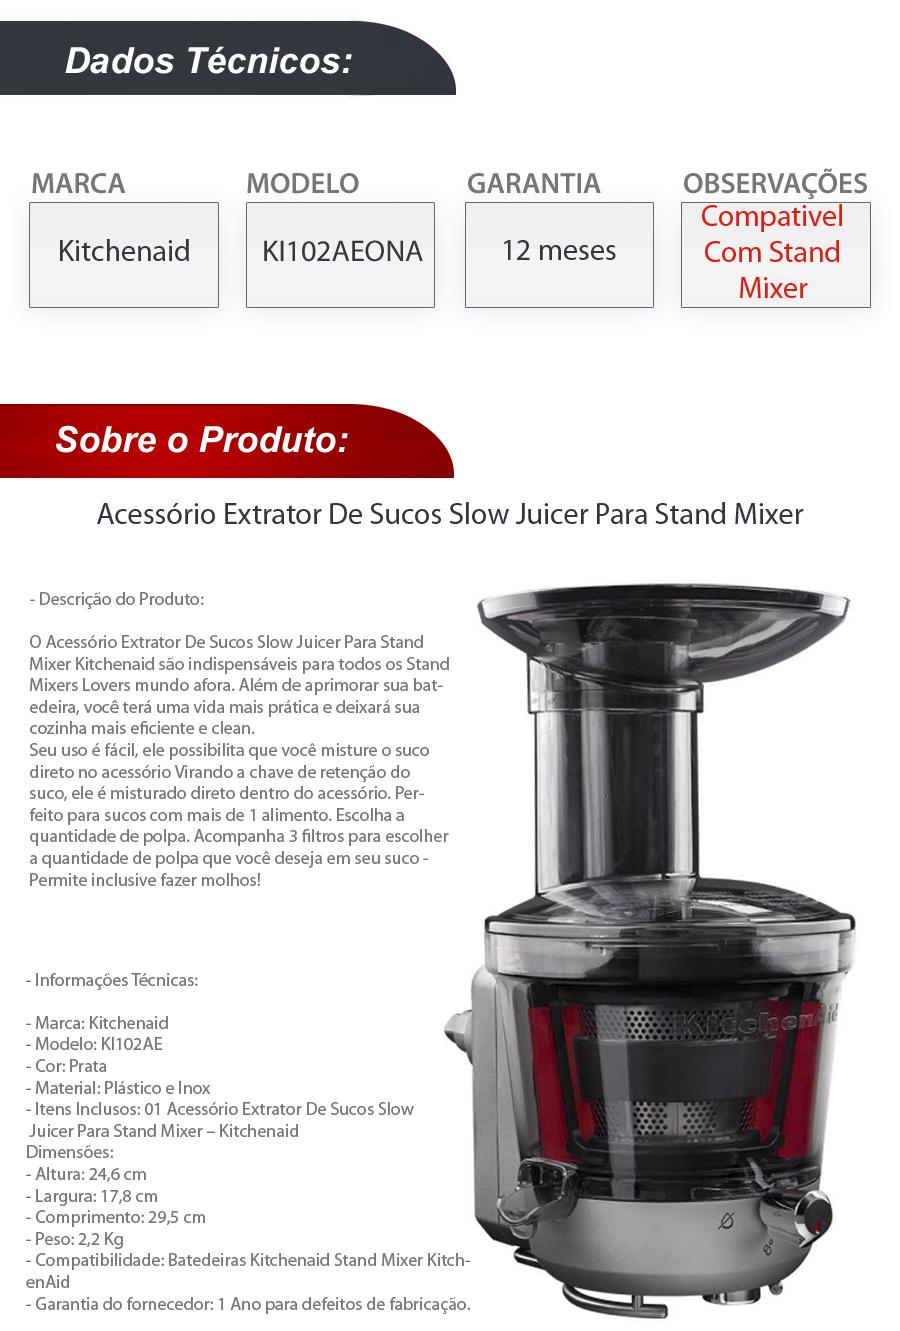 Slow Juicer Mondial Onde Comprar : Acessorio Extrator Sucos Slow Juicer Stand Mixer Kitchenaid - R$ 849,90 em Mercado Livre